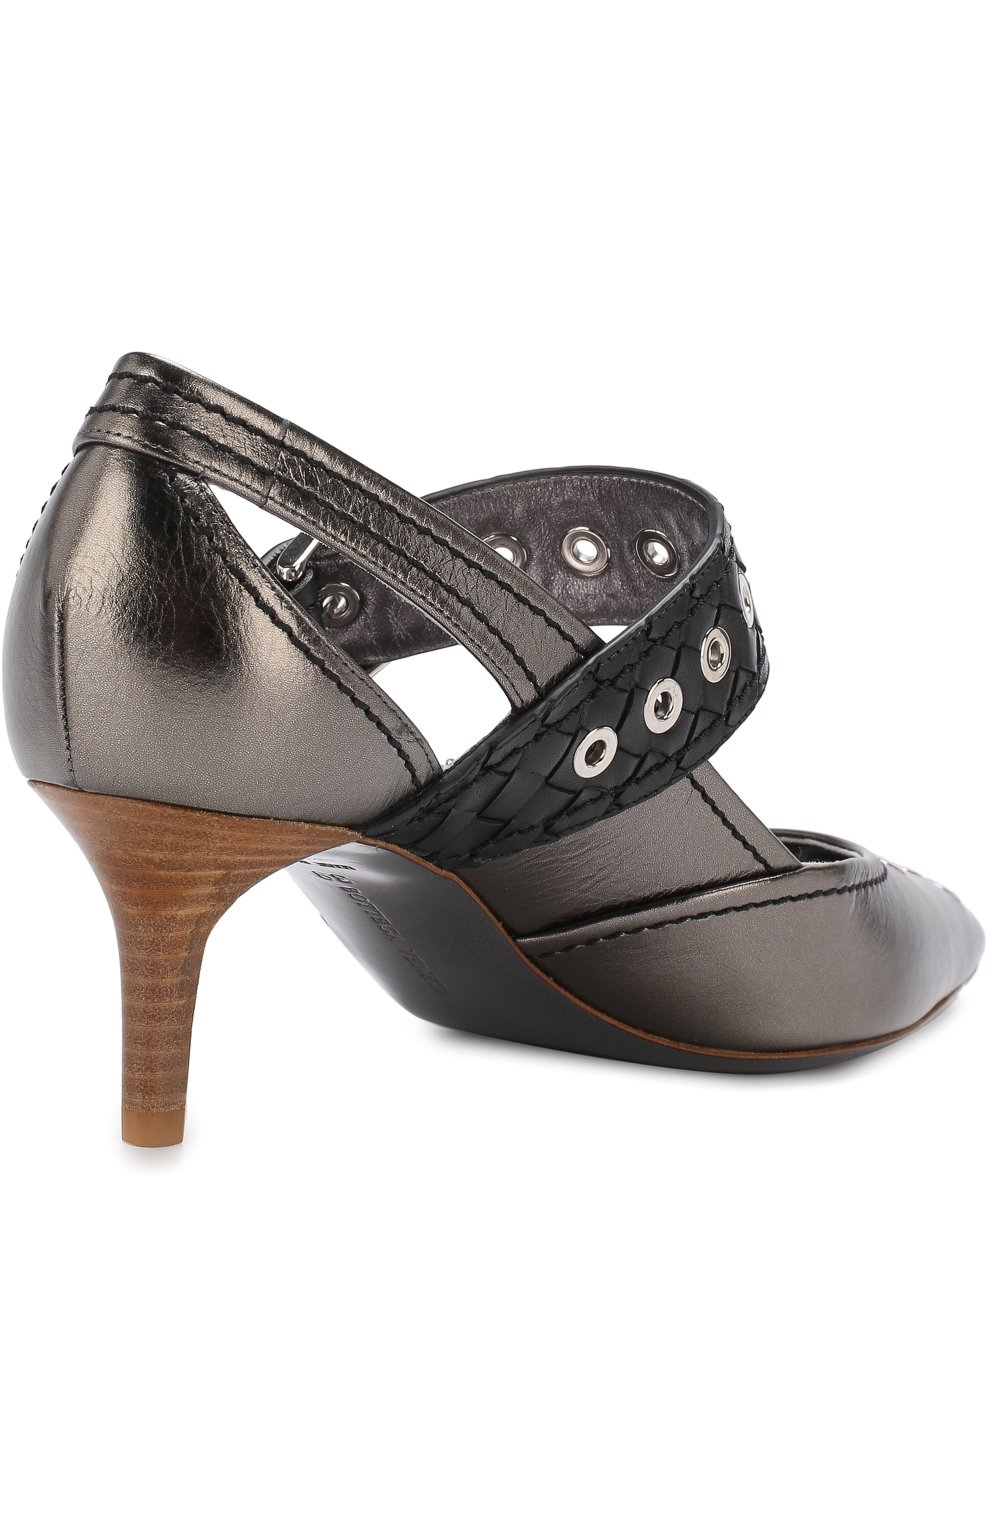 Женские туфли из металлизированной кожи на каблуке kitten heel BOTTEGA VENETA серебряного цвета, арт. 512136/VAVG6 | Фото 4